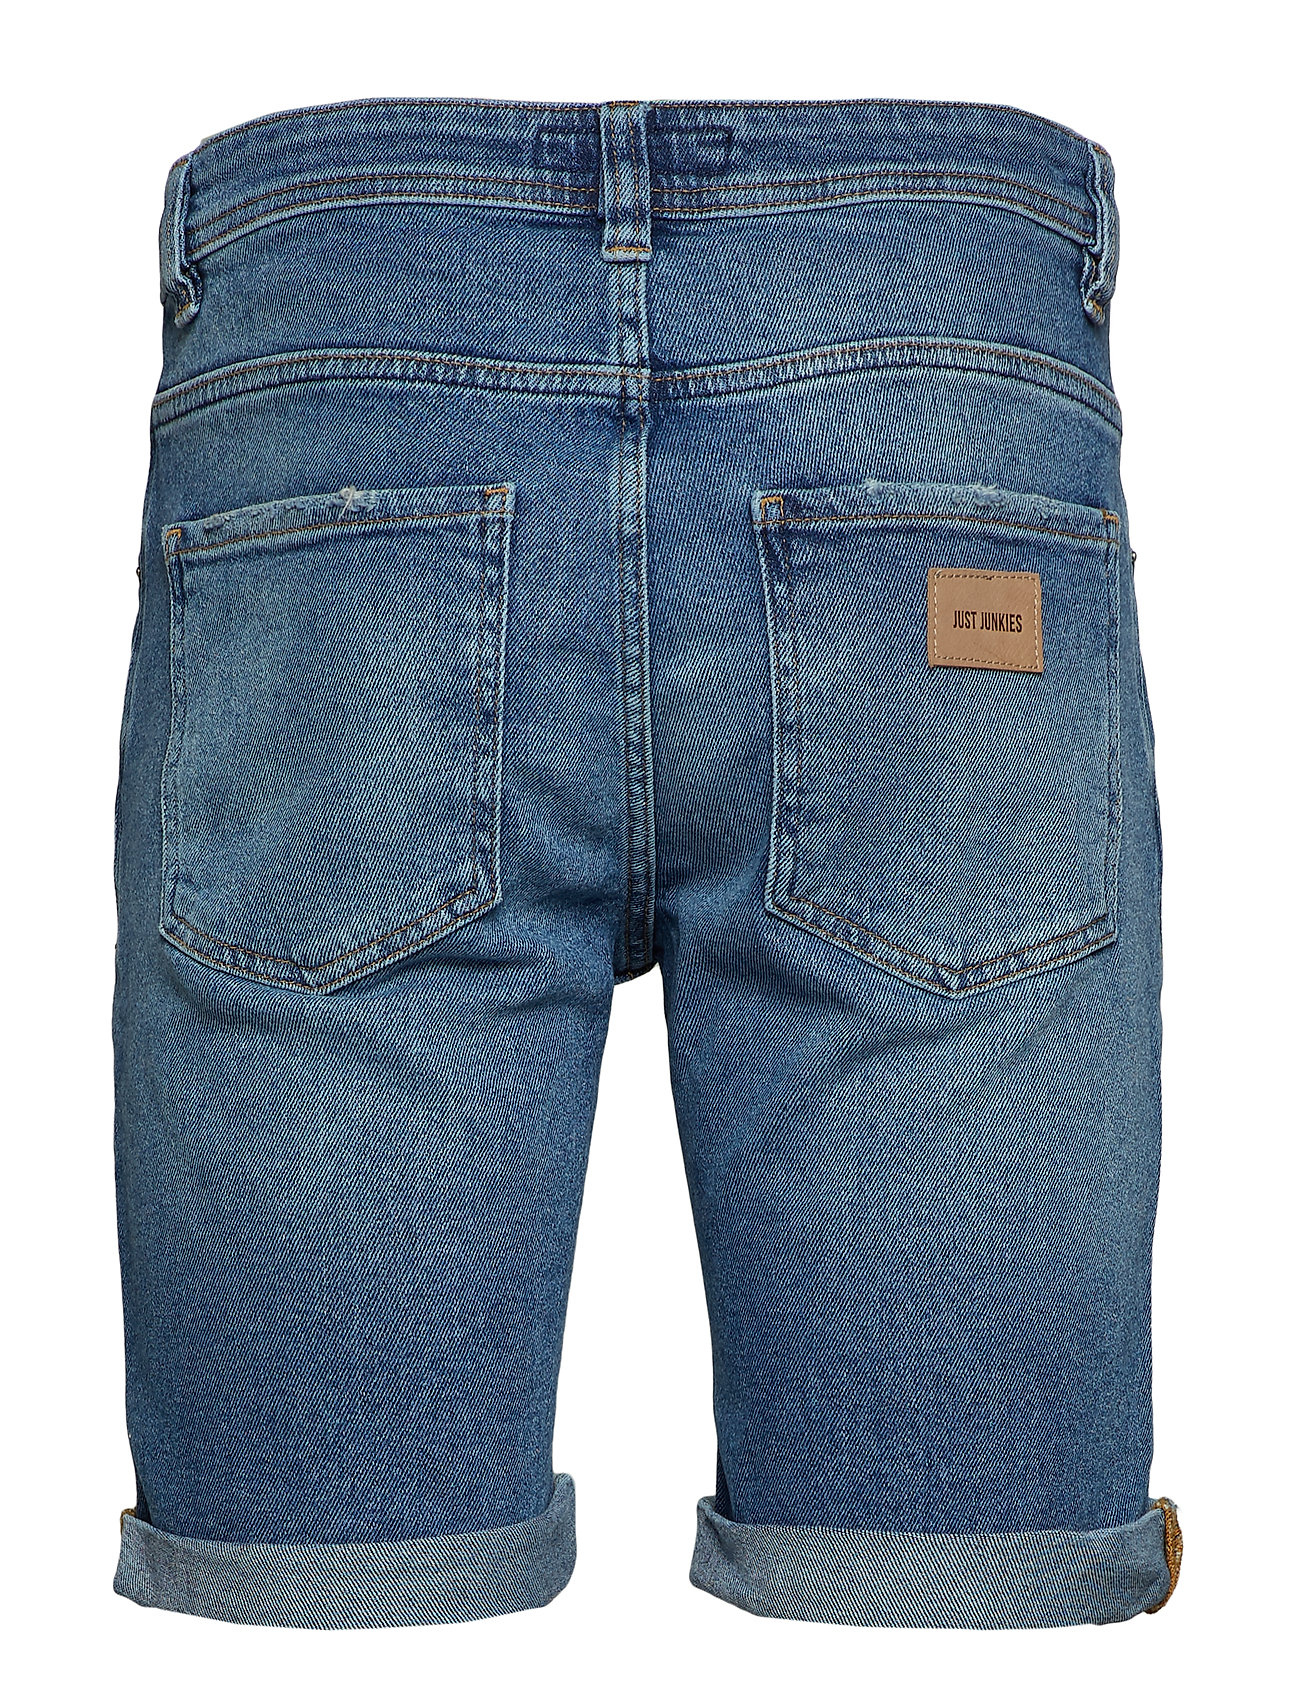 Mike HolesJust Blue Shorts Junkies Pbhpillow JTlKcF1